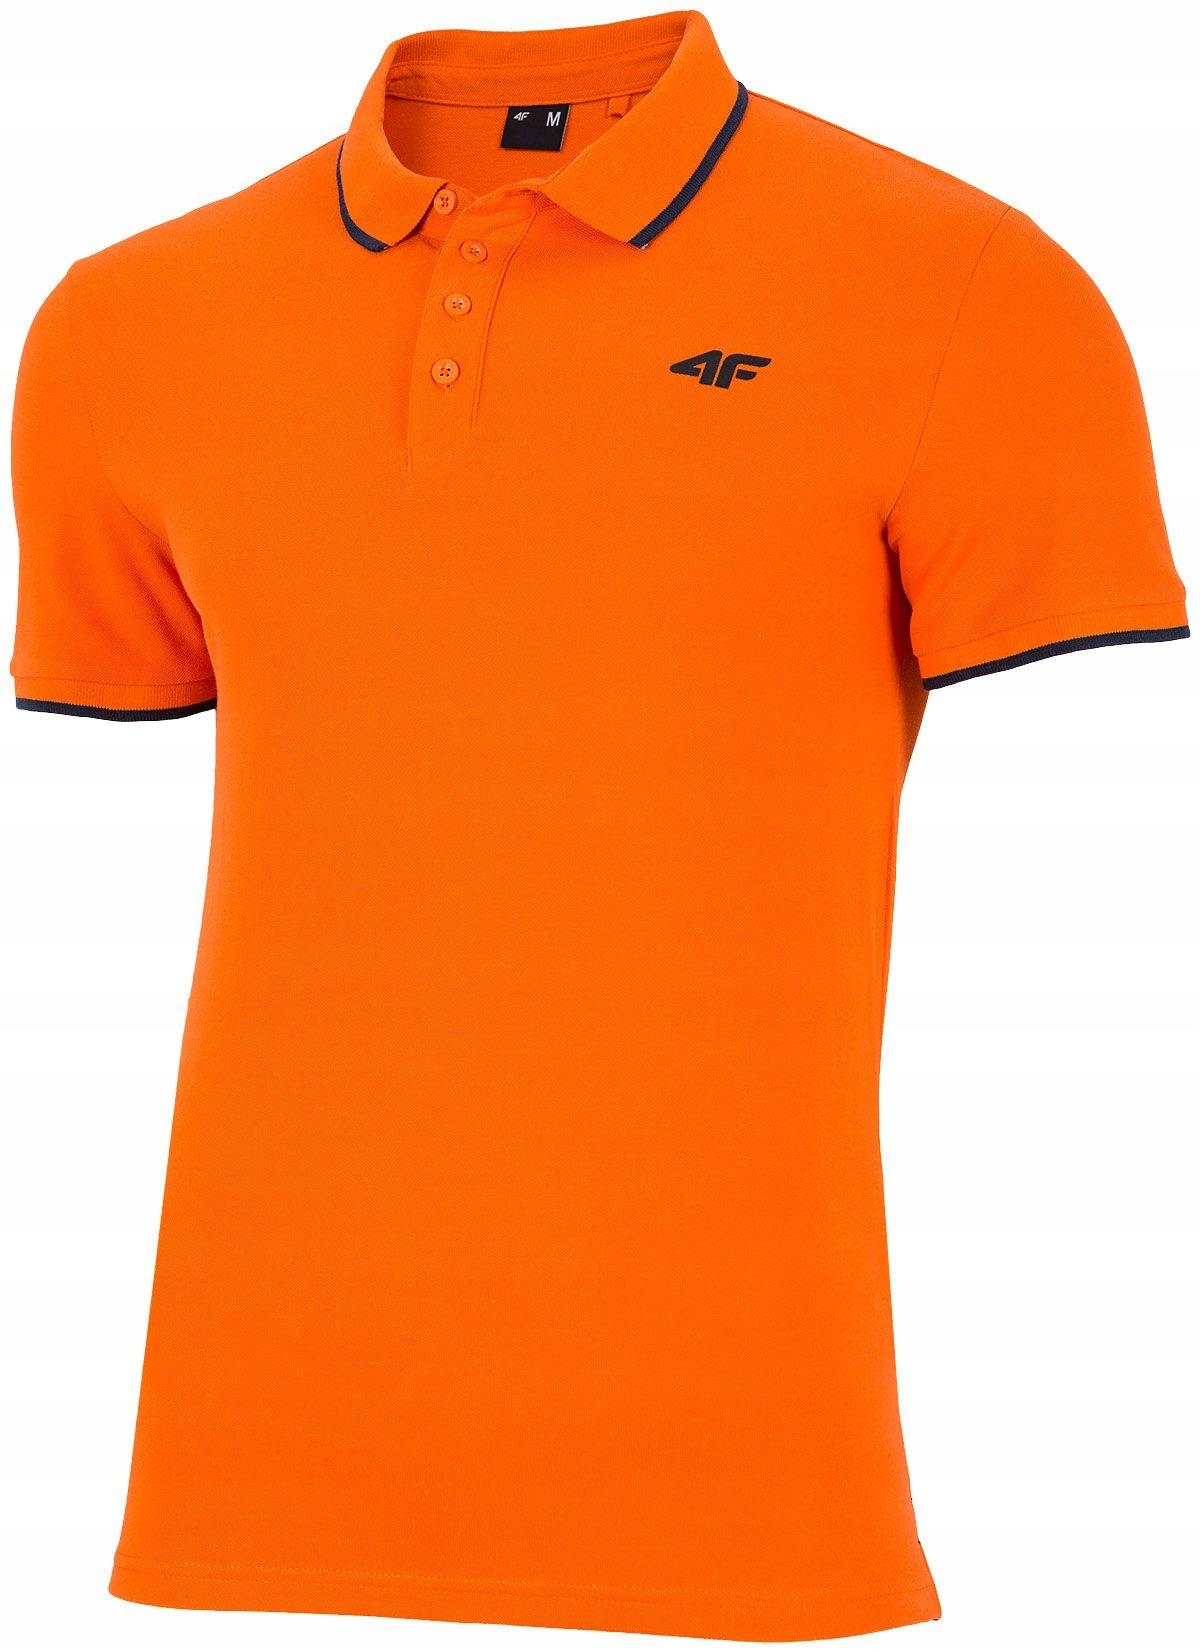 Koszulka POLO męska T-SHIRT bawełna 4F TSM024 XL